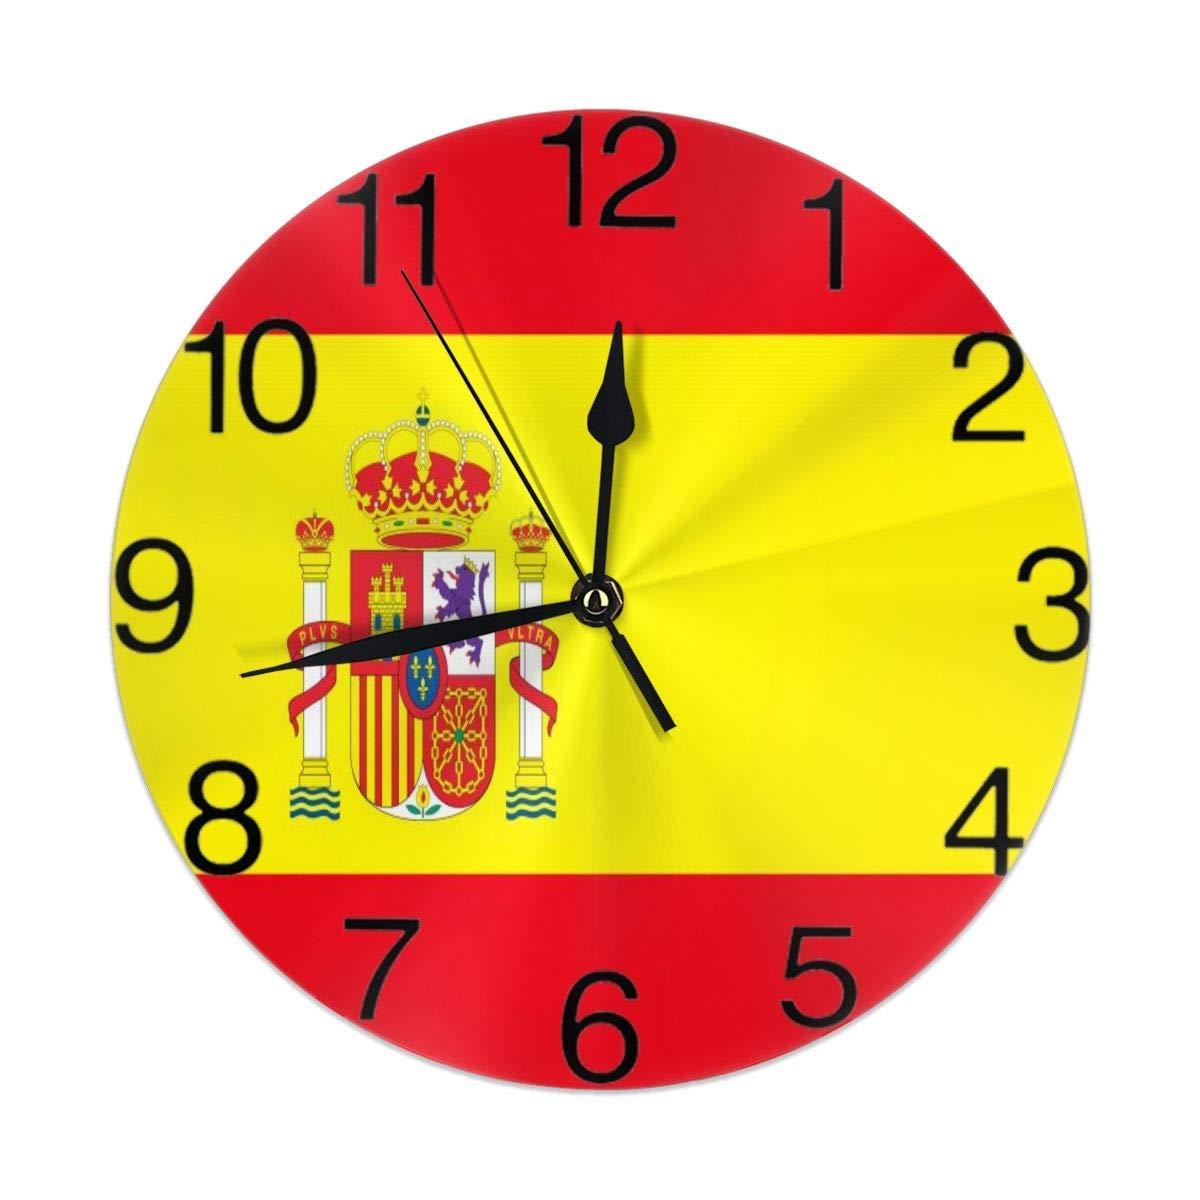 Eileen Max Bandera de España Reloj de Pared Redondo para Estudiante Oficina Escuela Hogar Decorativo Reloj Arte: Amazon.es: Hogar